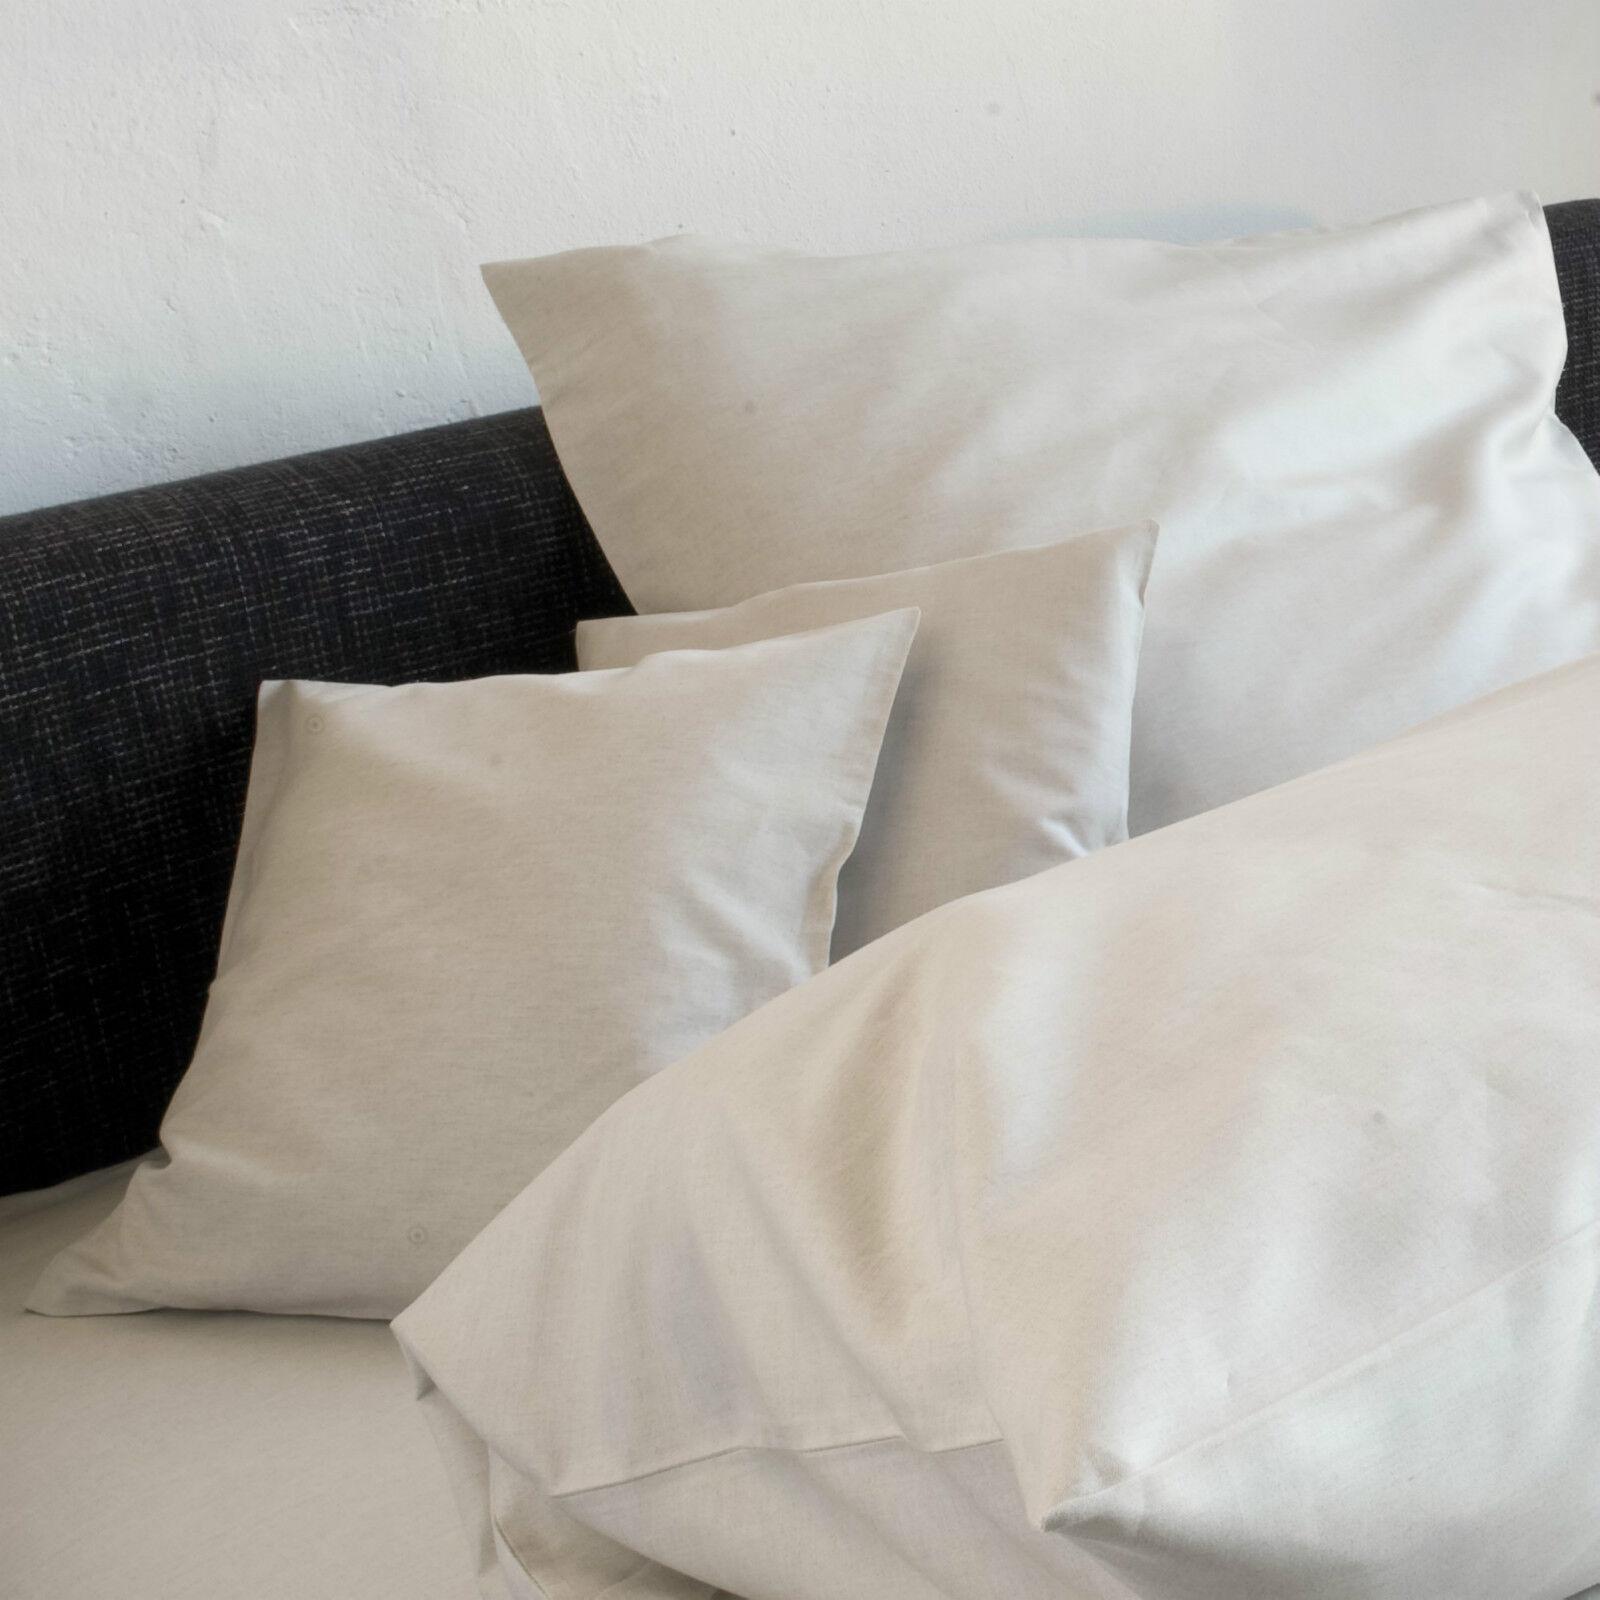 Leinen Bettwäsche aus Leinen Spann-Bettlaken 100 x 200 - 160 x 200 Natura natur